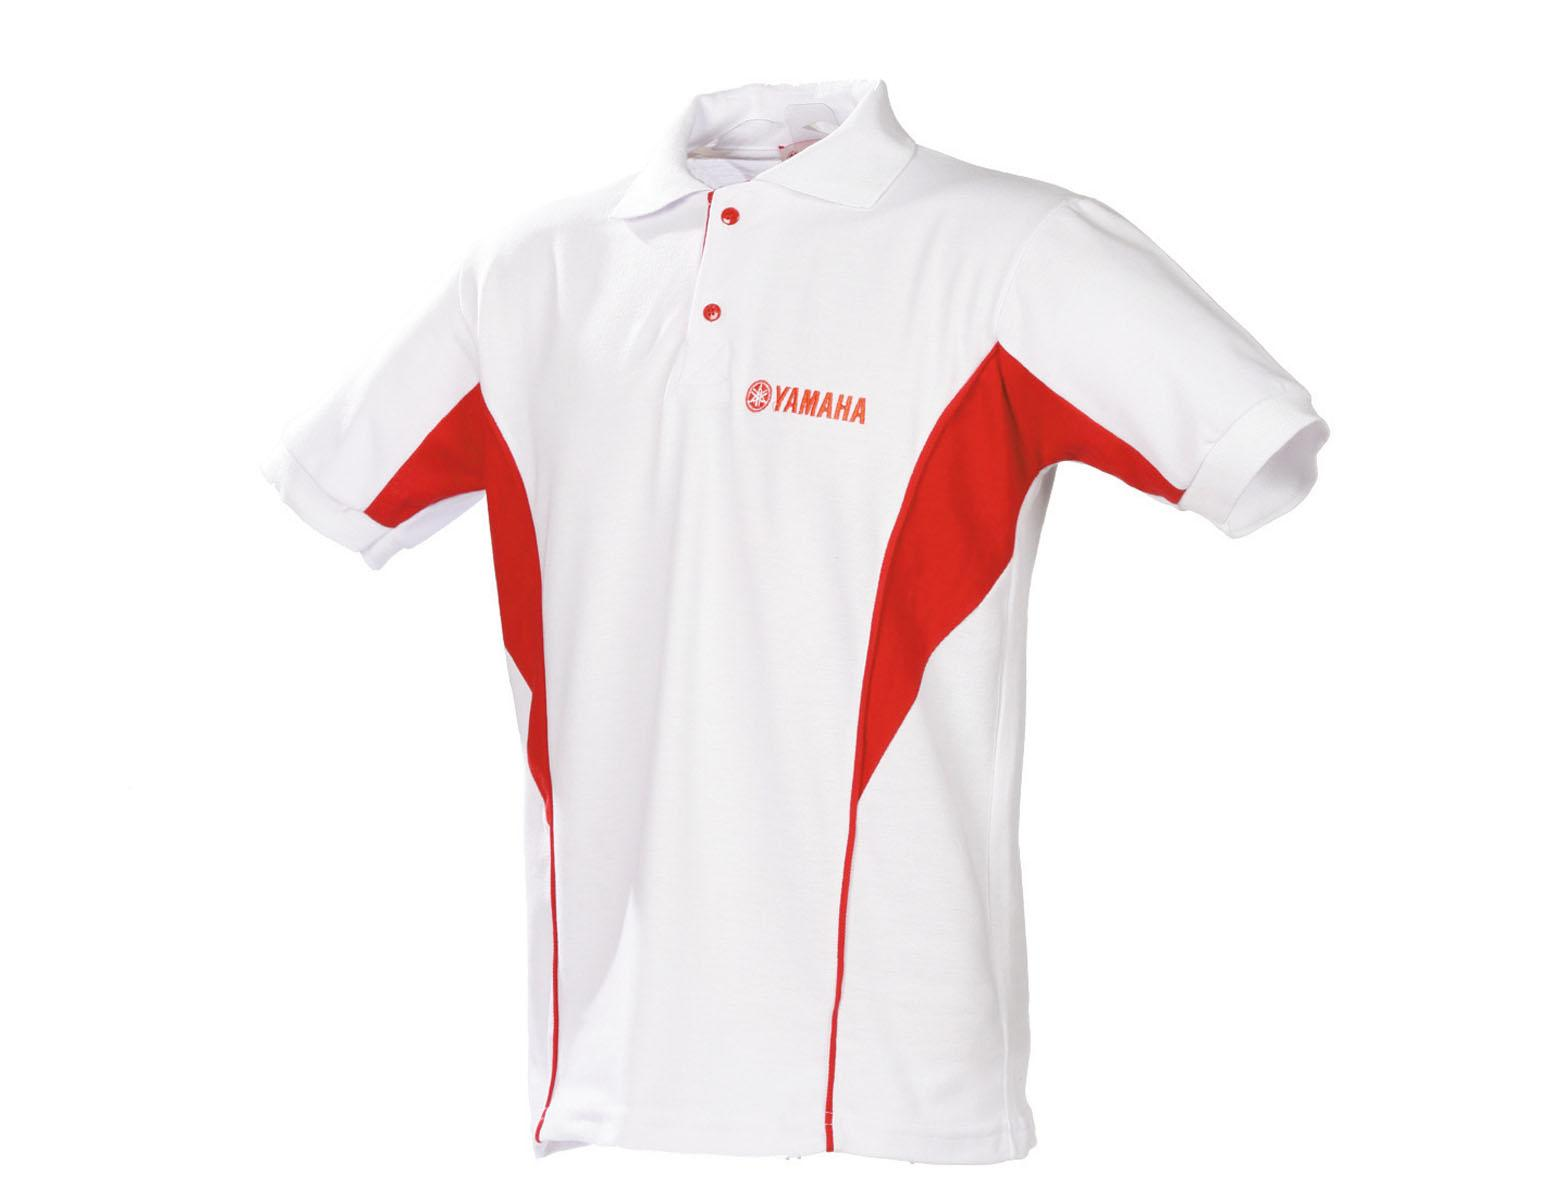 e1d89a9f396e0 camiseta polo comprar Archives - Minuto LigadoMinuto Ligado